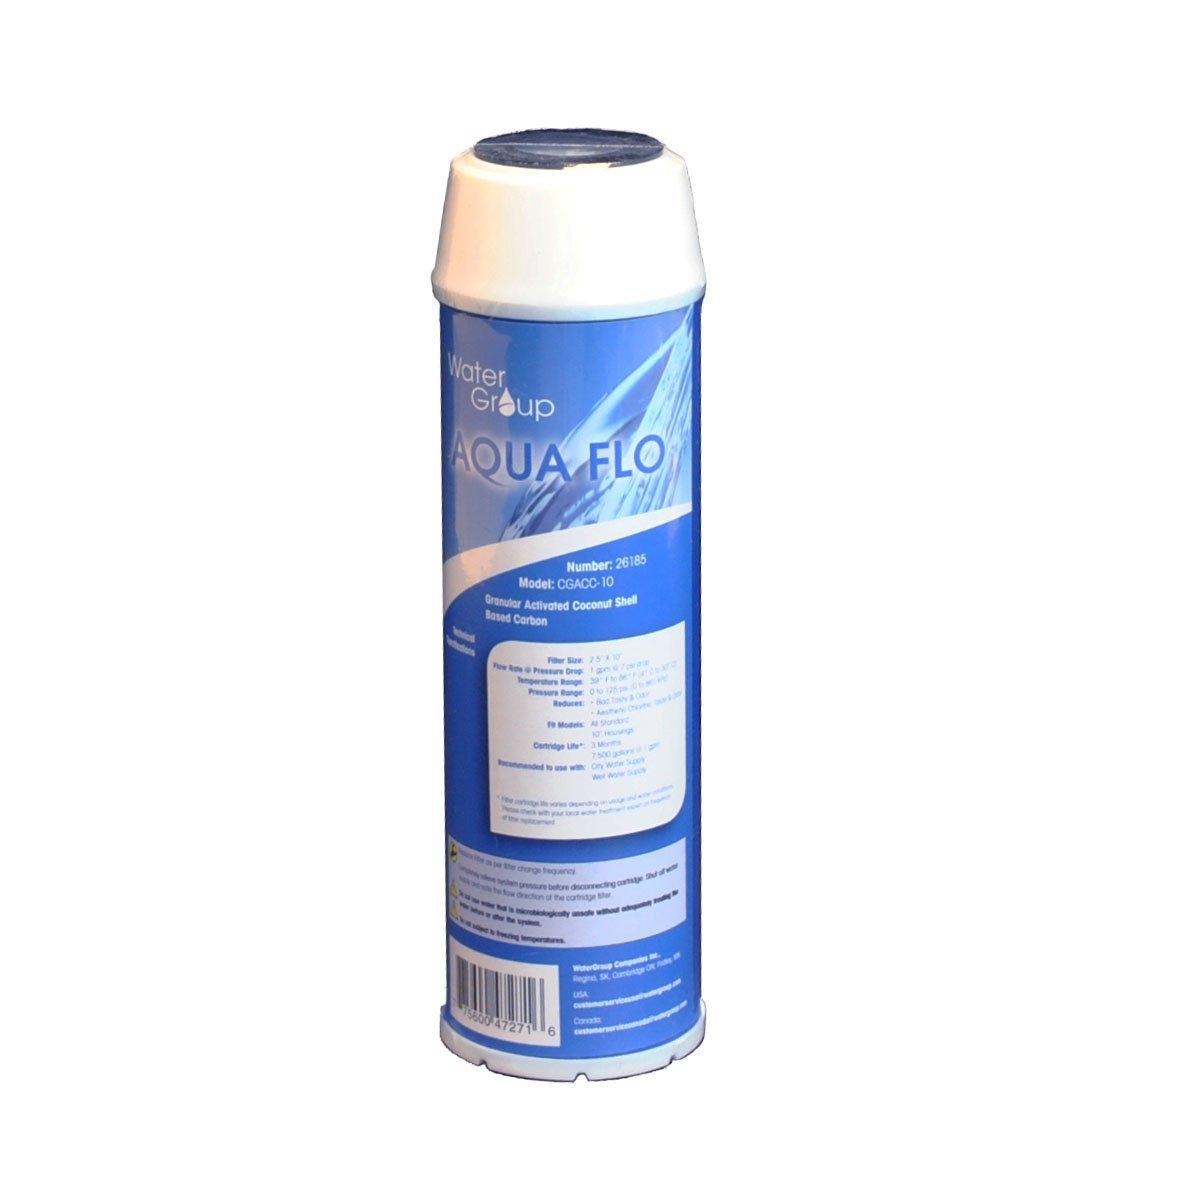 Aqua Flo Water Filter Coconut Granular Activated Carbon